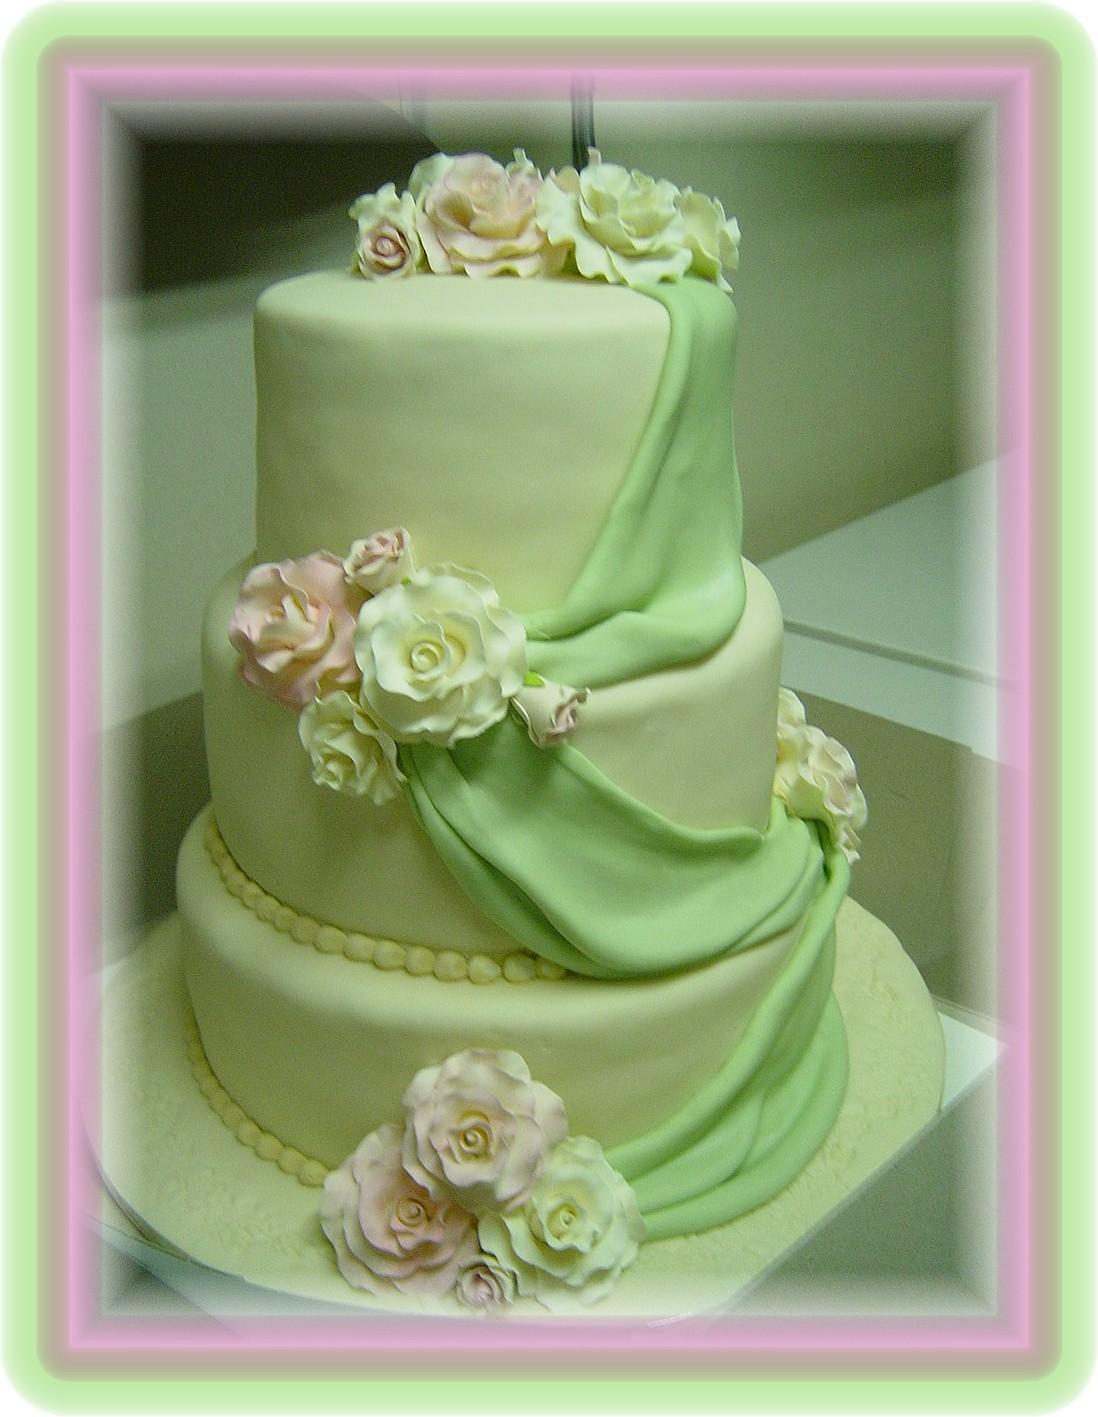 Cakes Randm92s Weblog